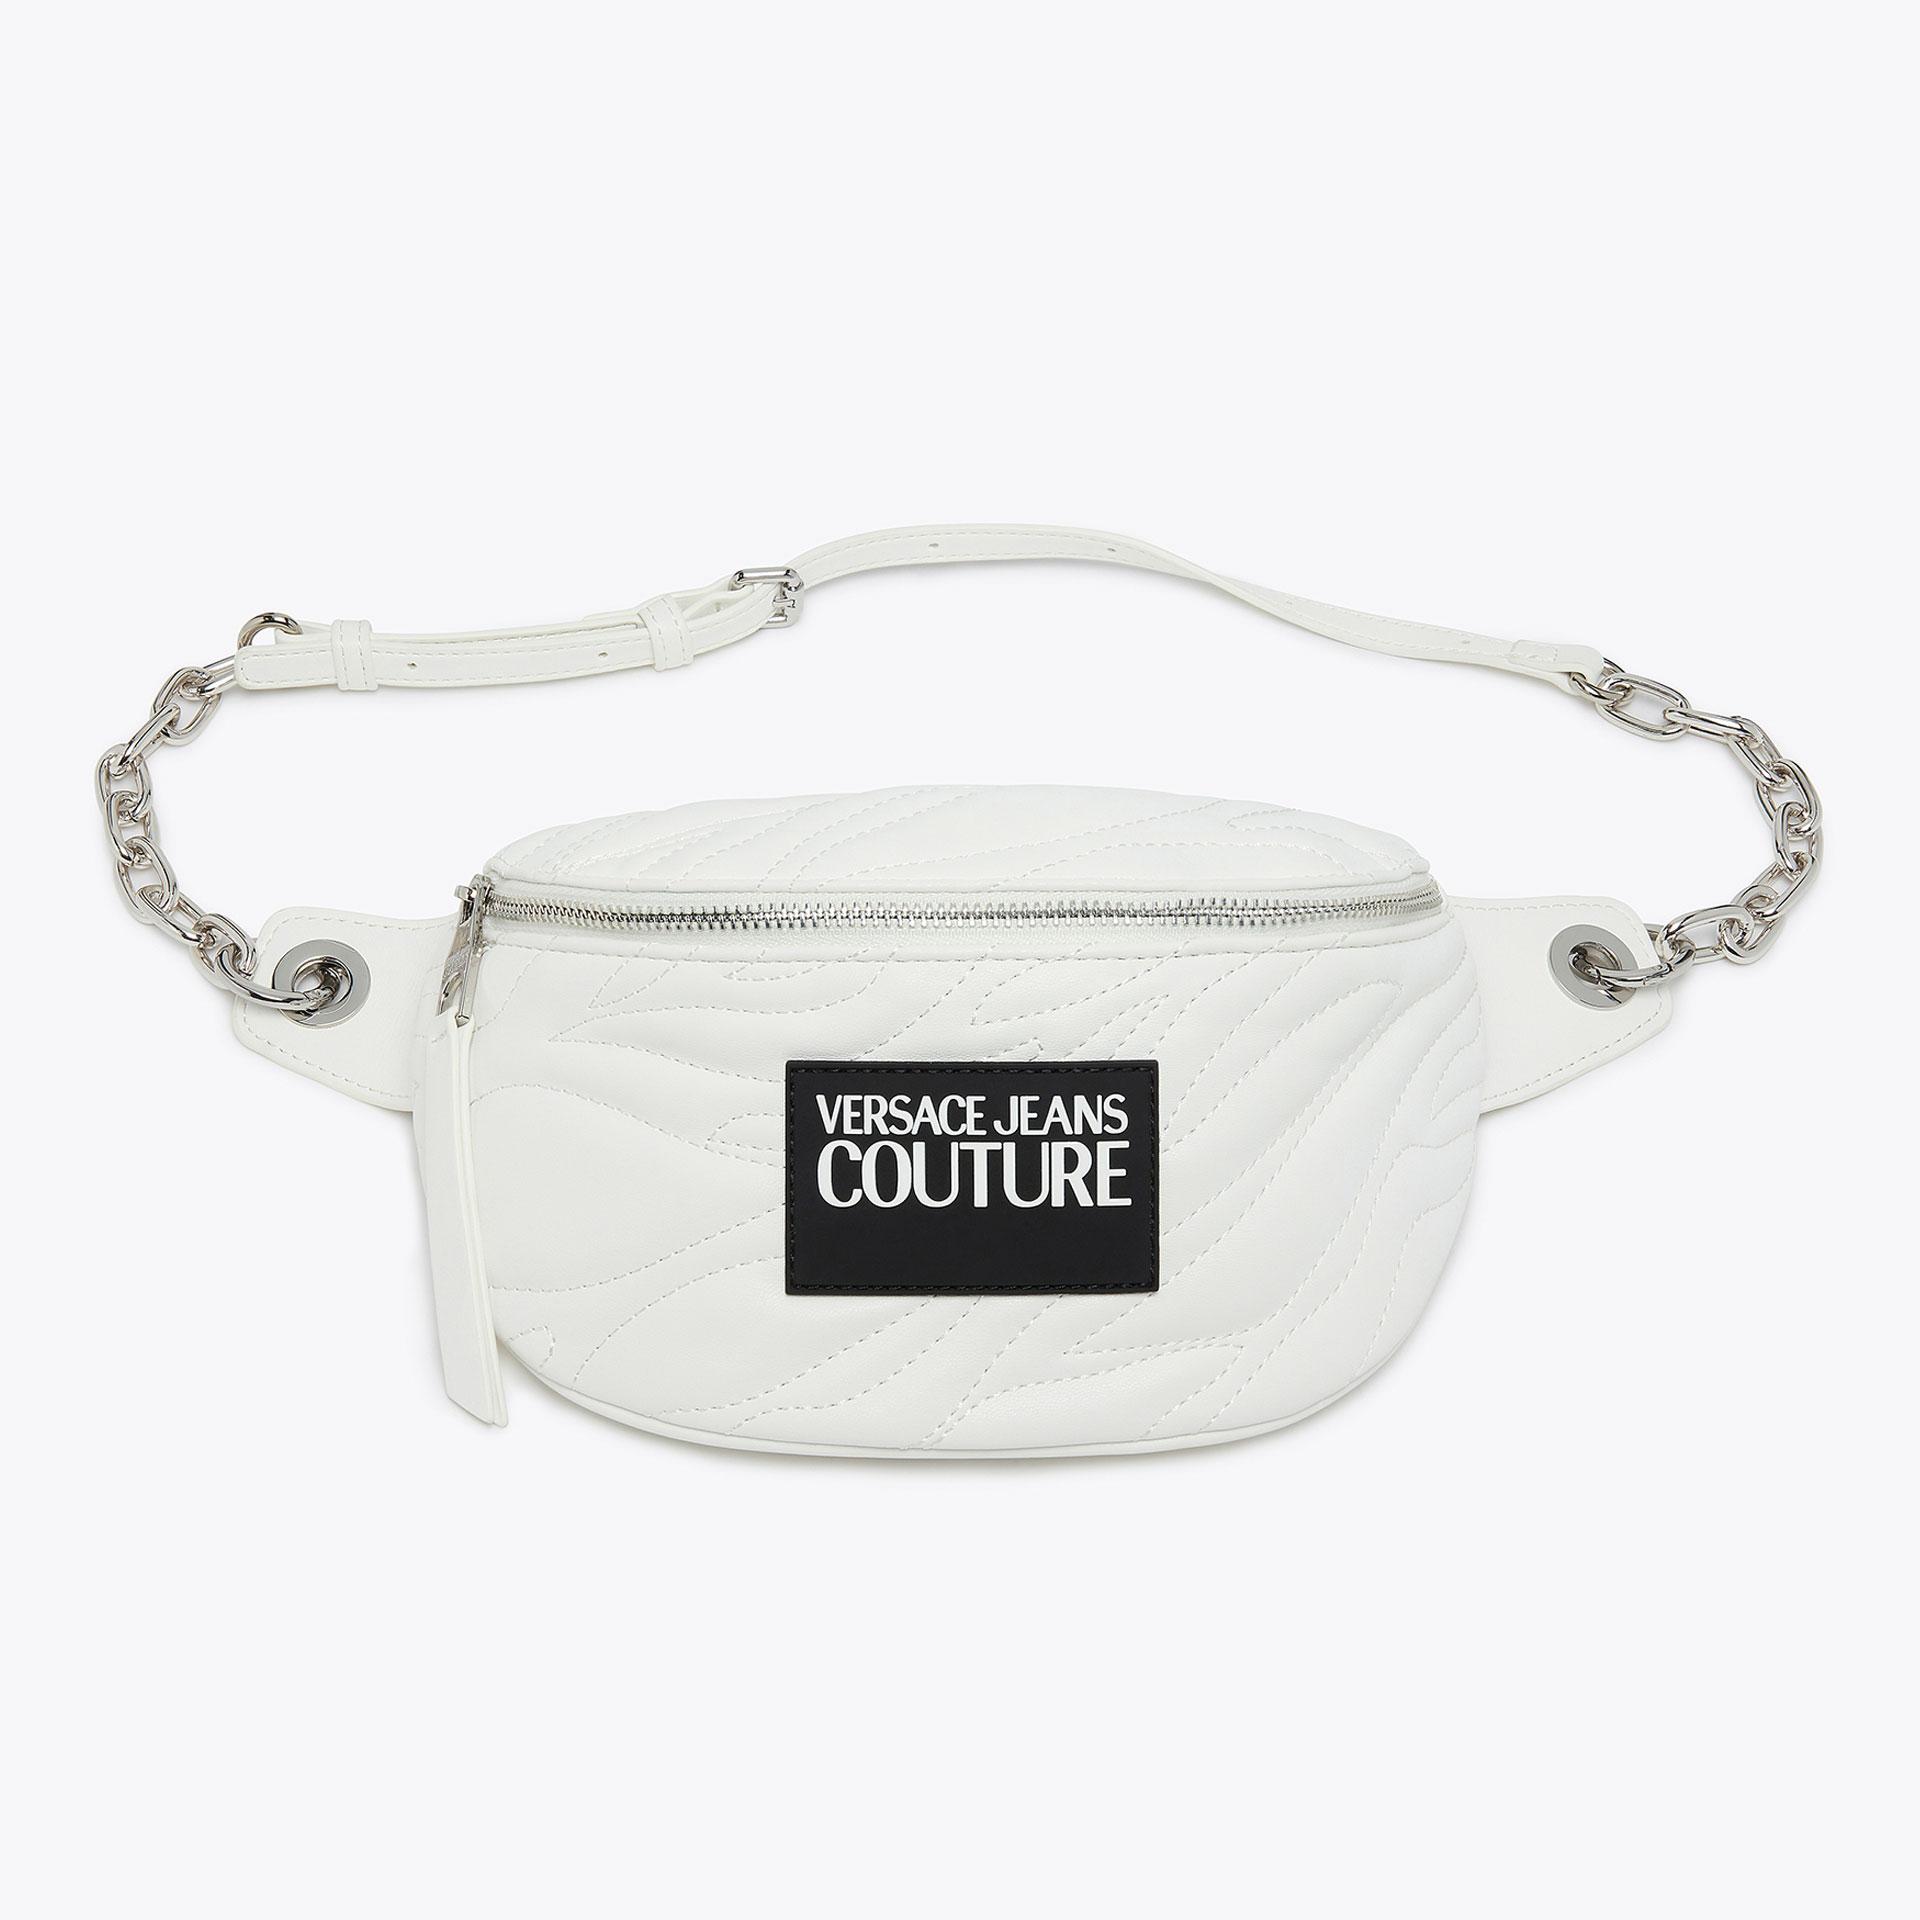 versace white men purse